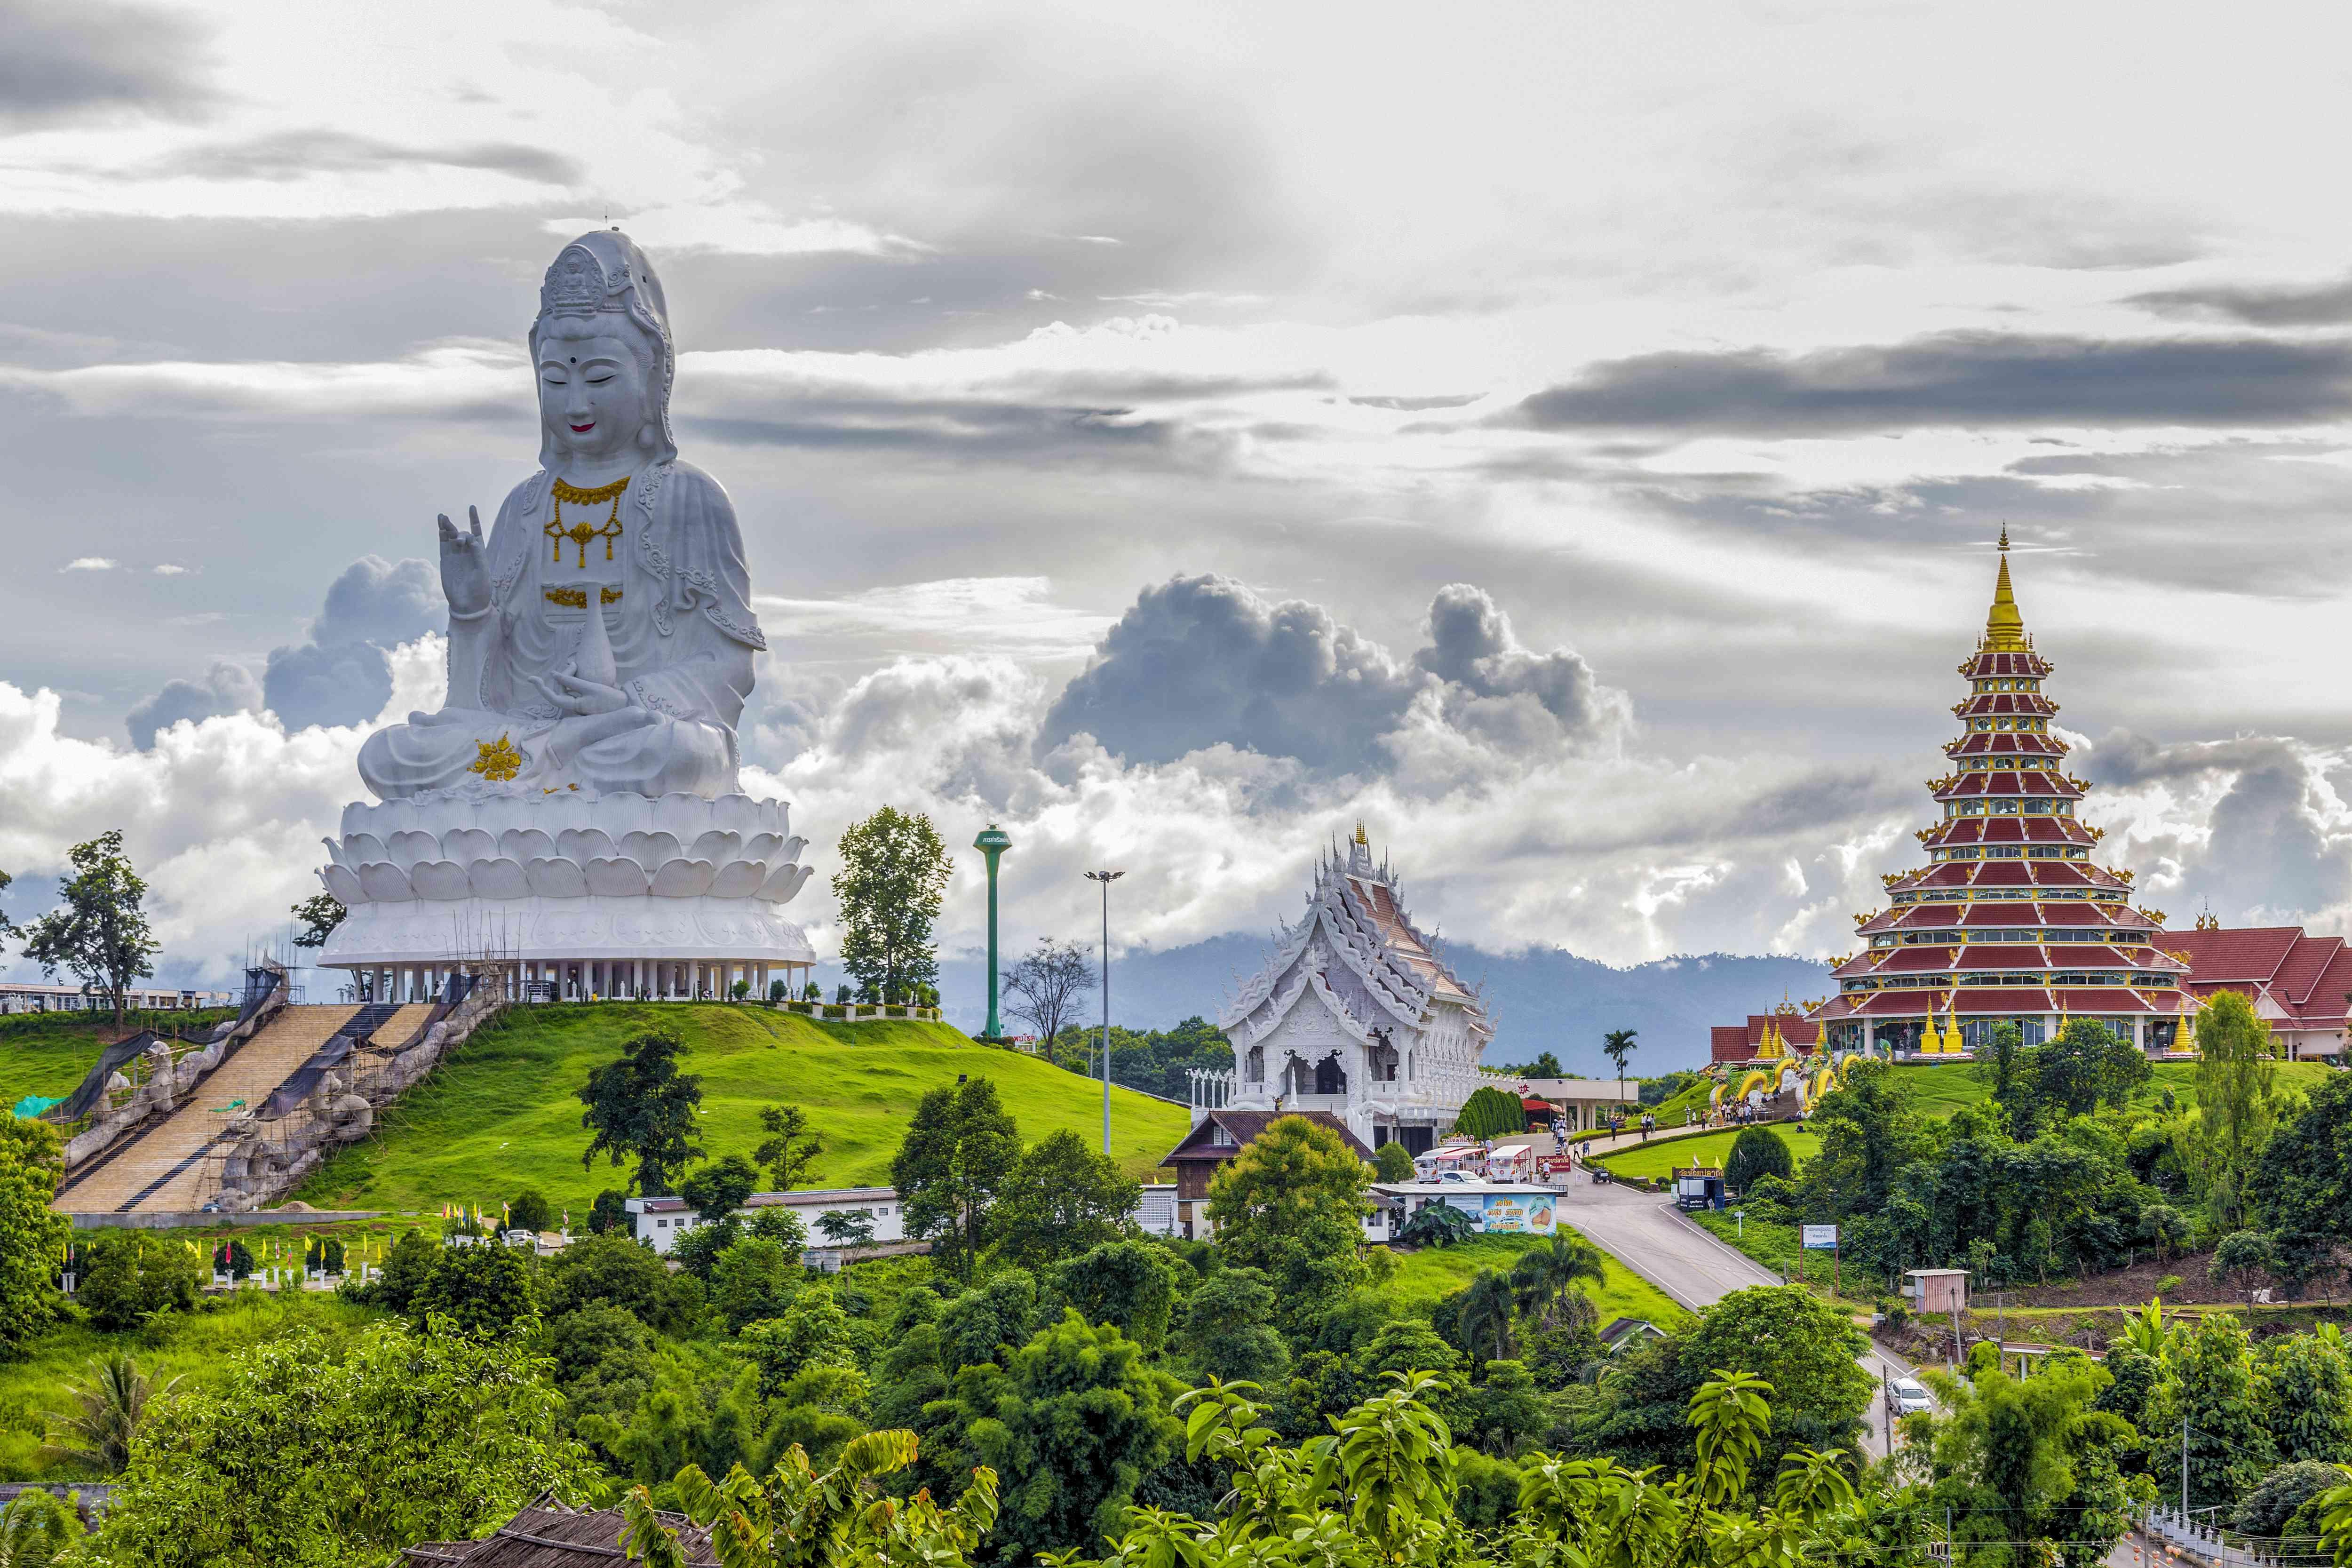 A temple and white Buddha statue in Chiang Rai, Thailand